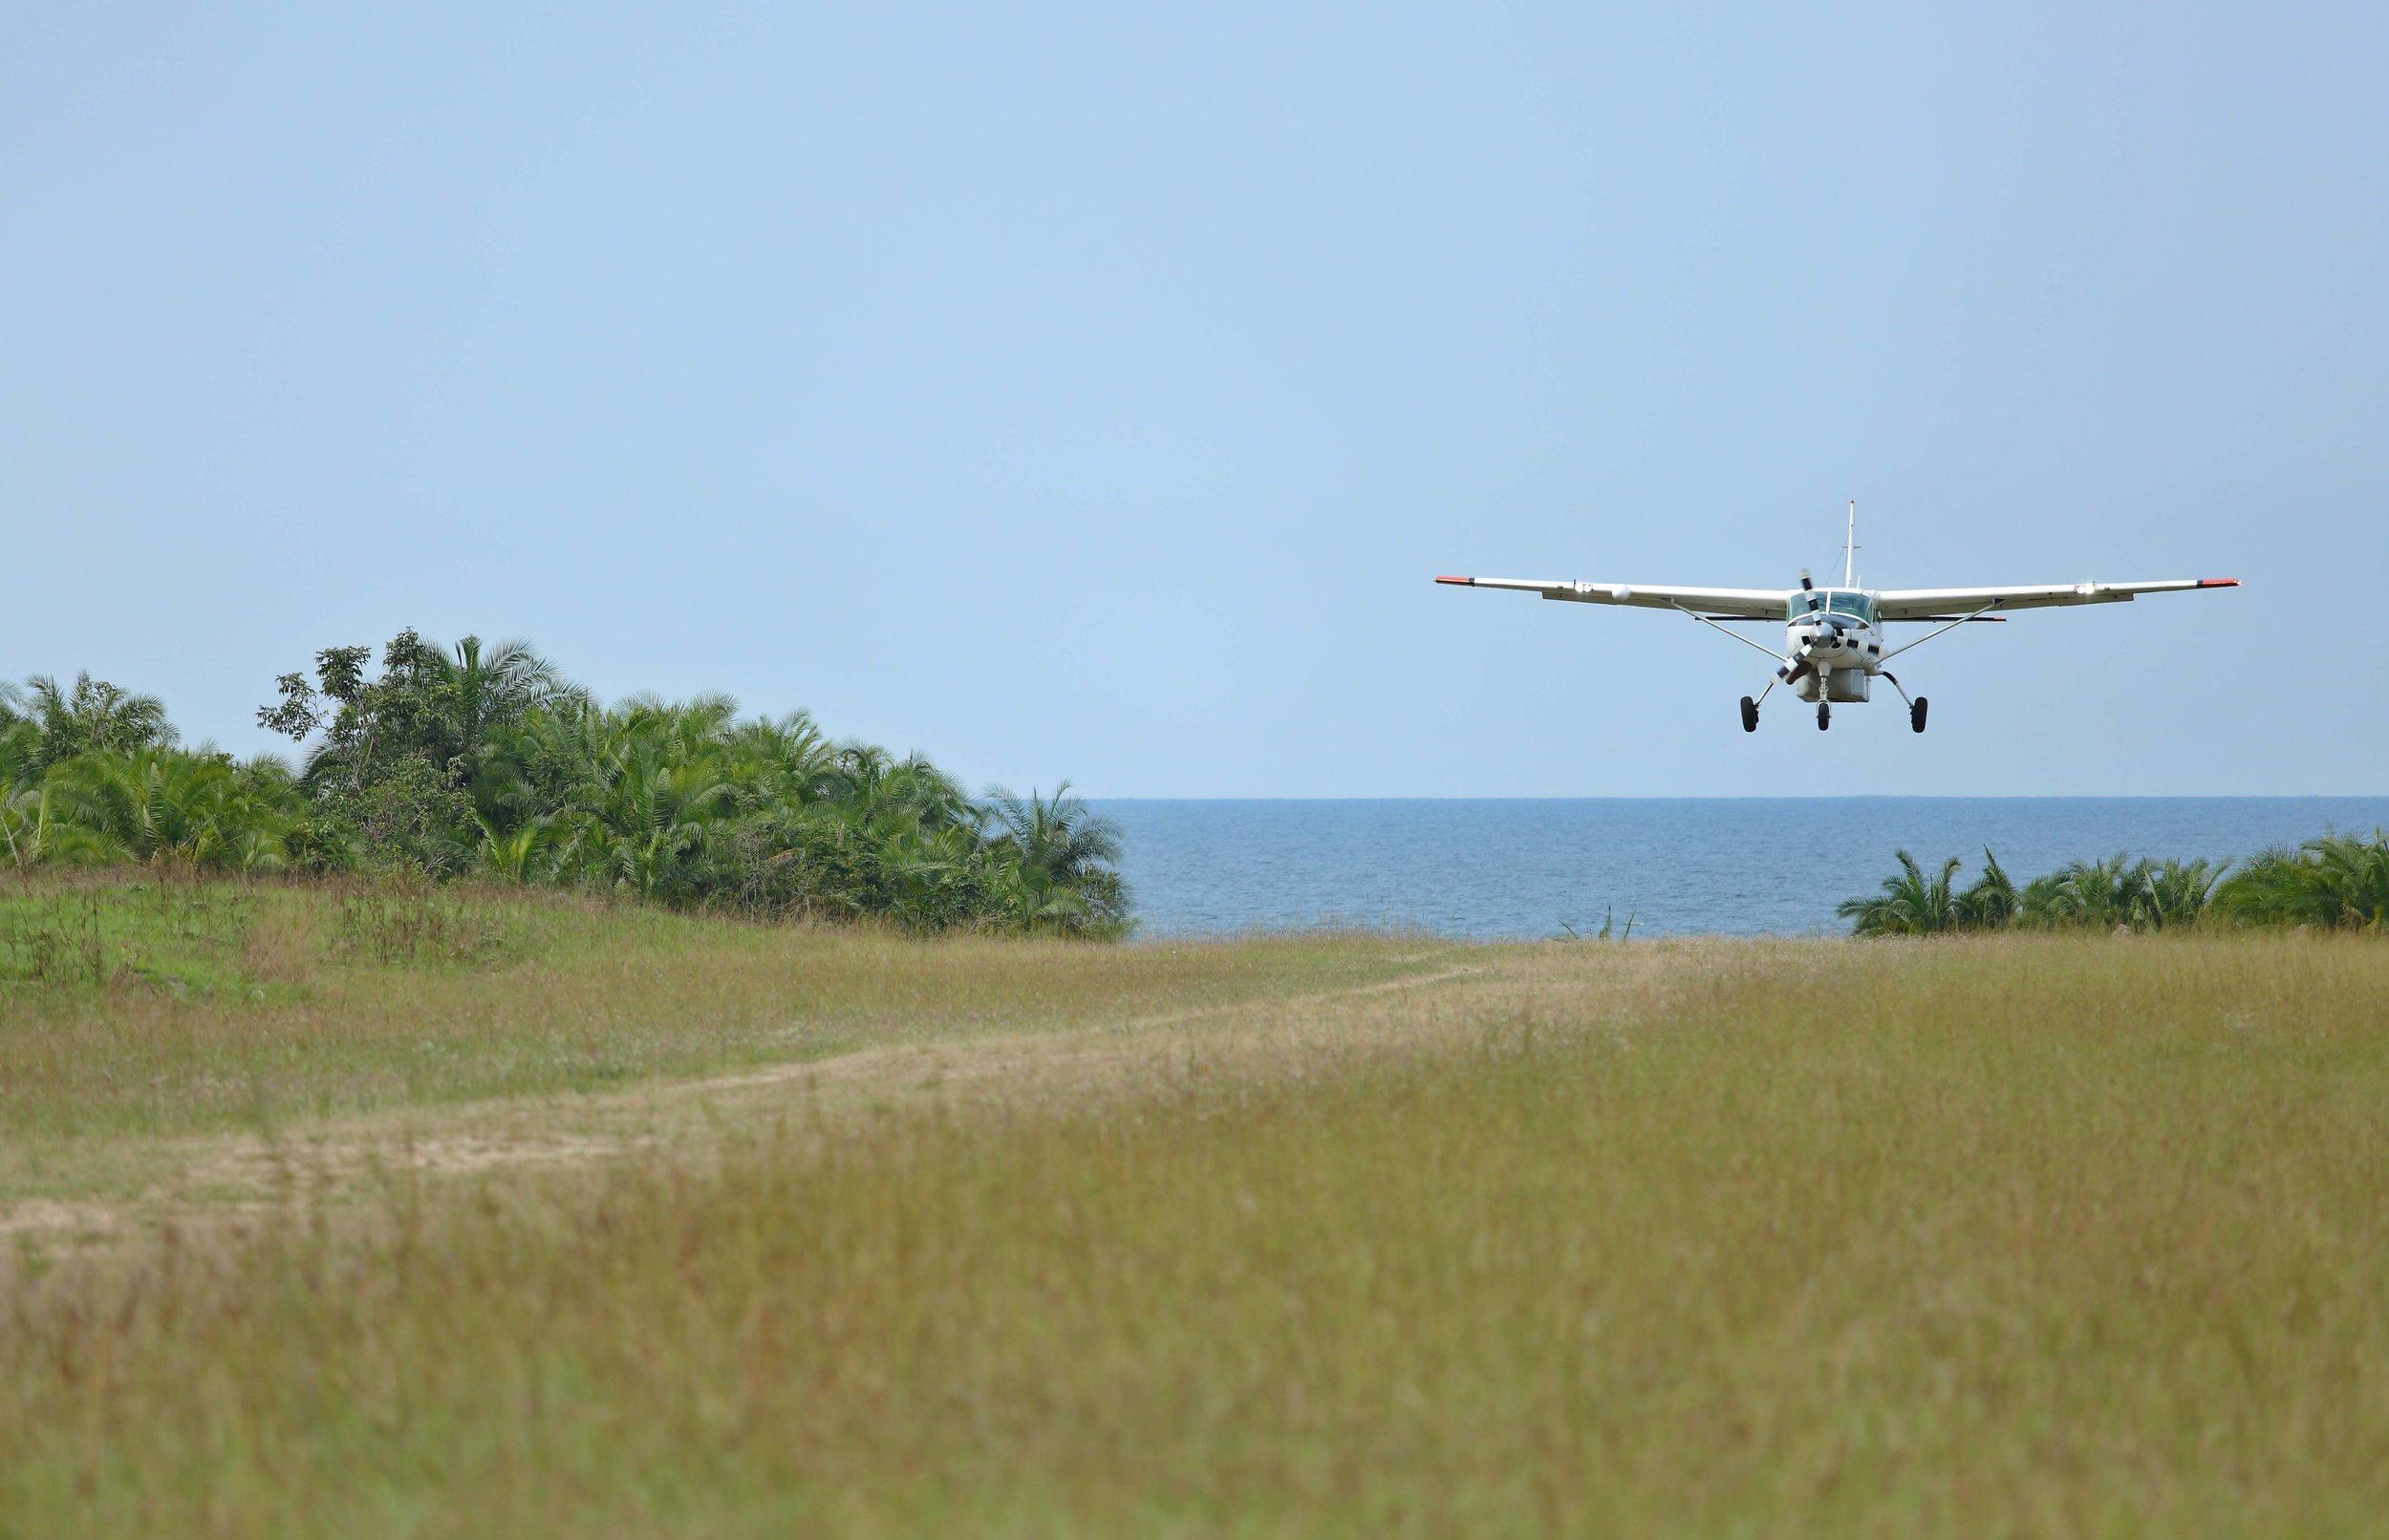 Rubondo-Island-landing-on-the-Islands-airstrip.jpg